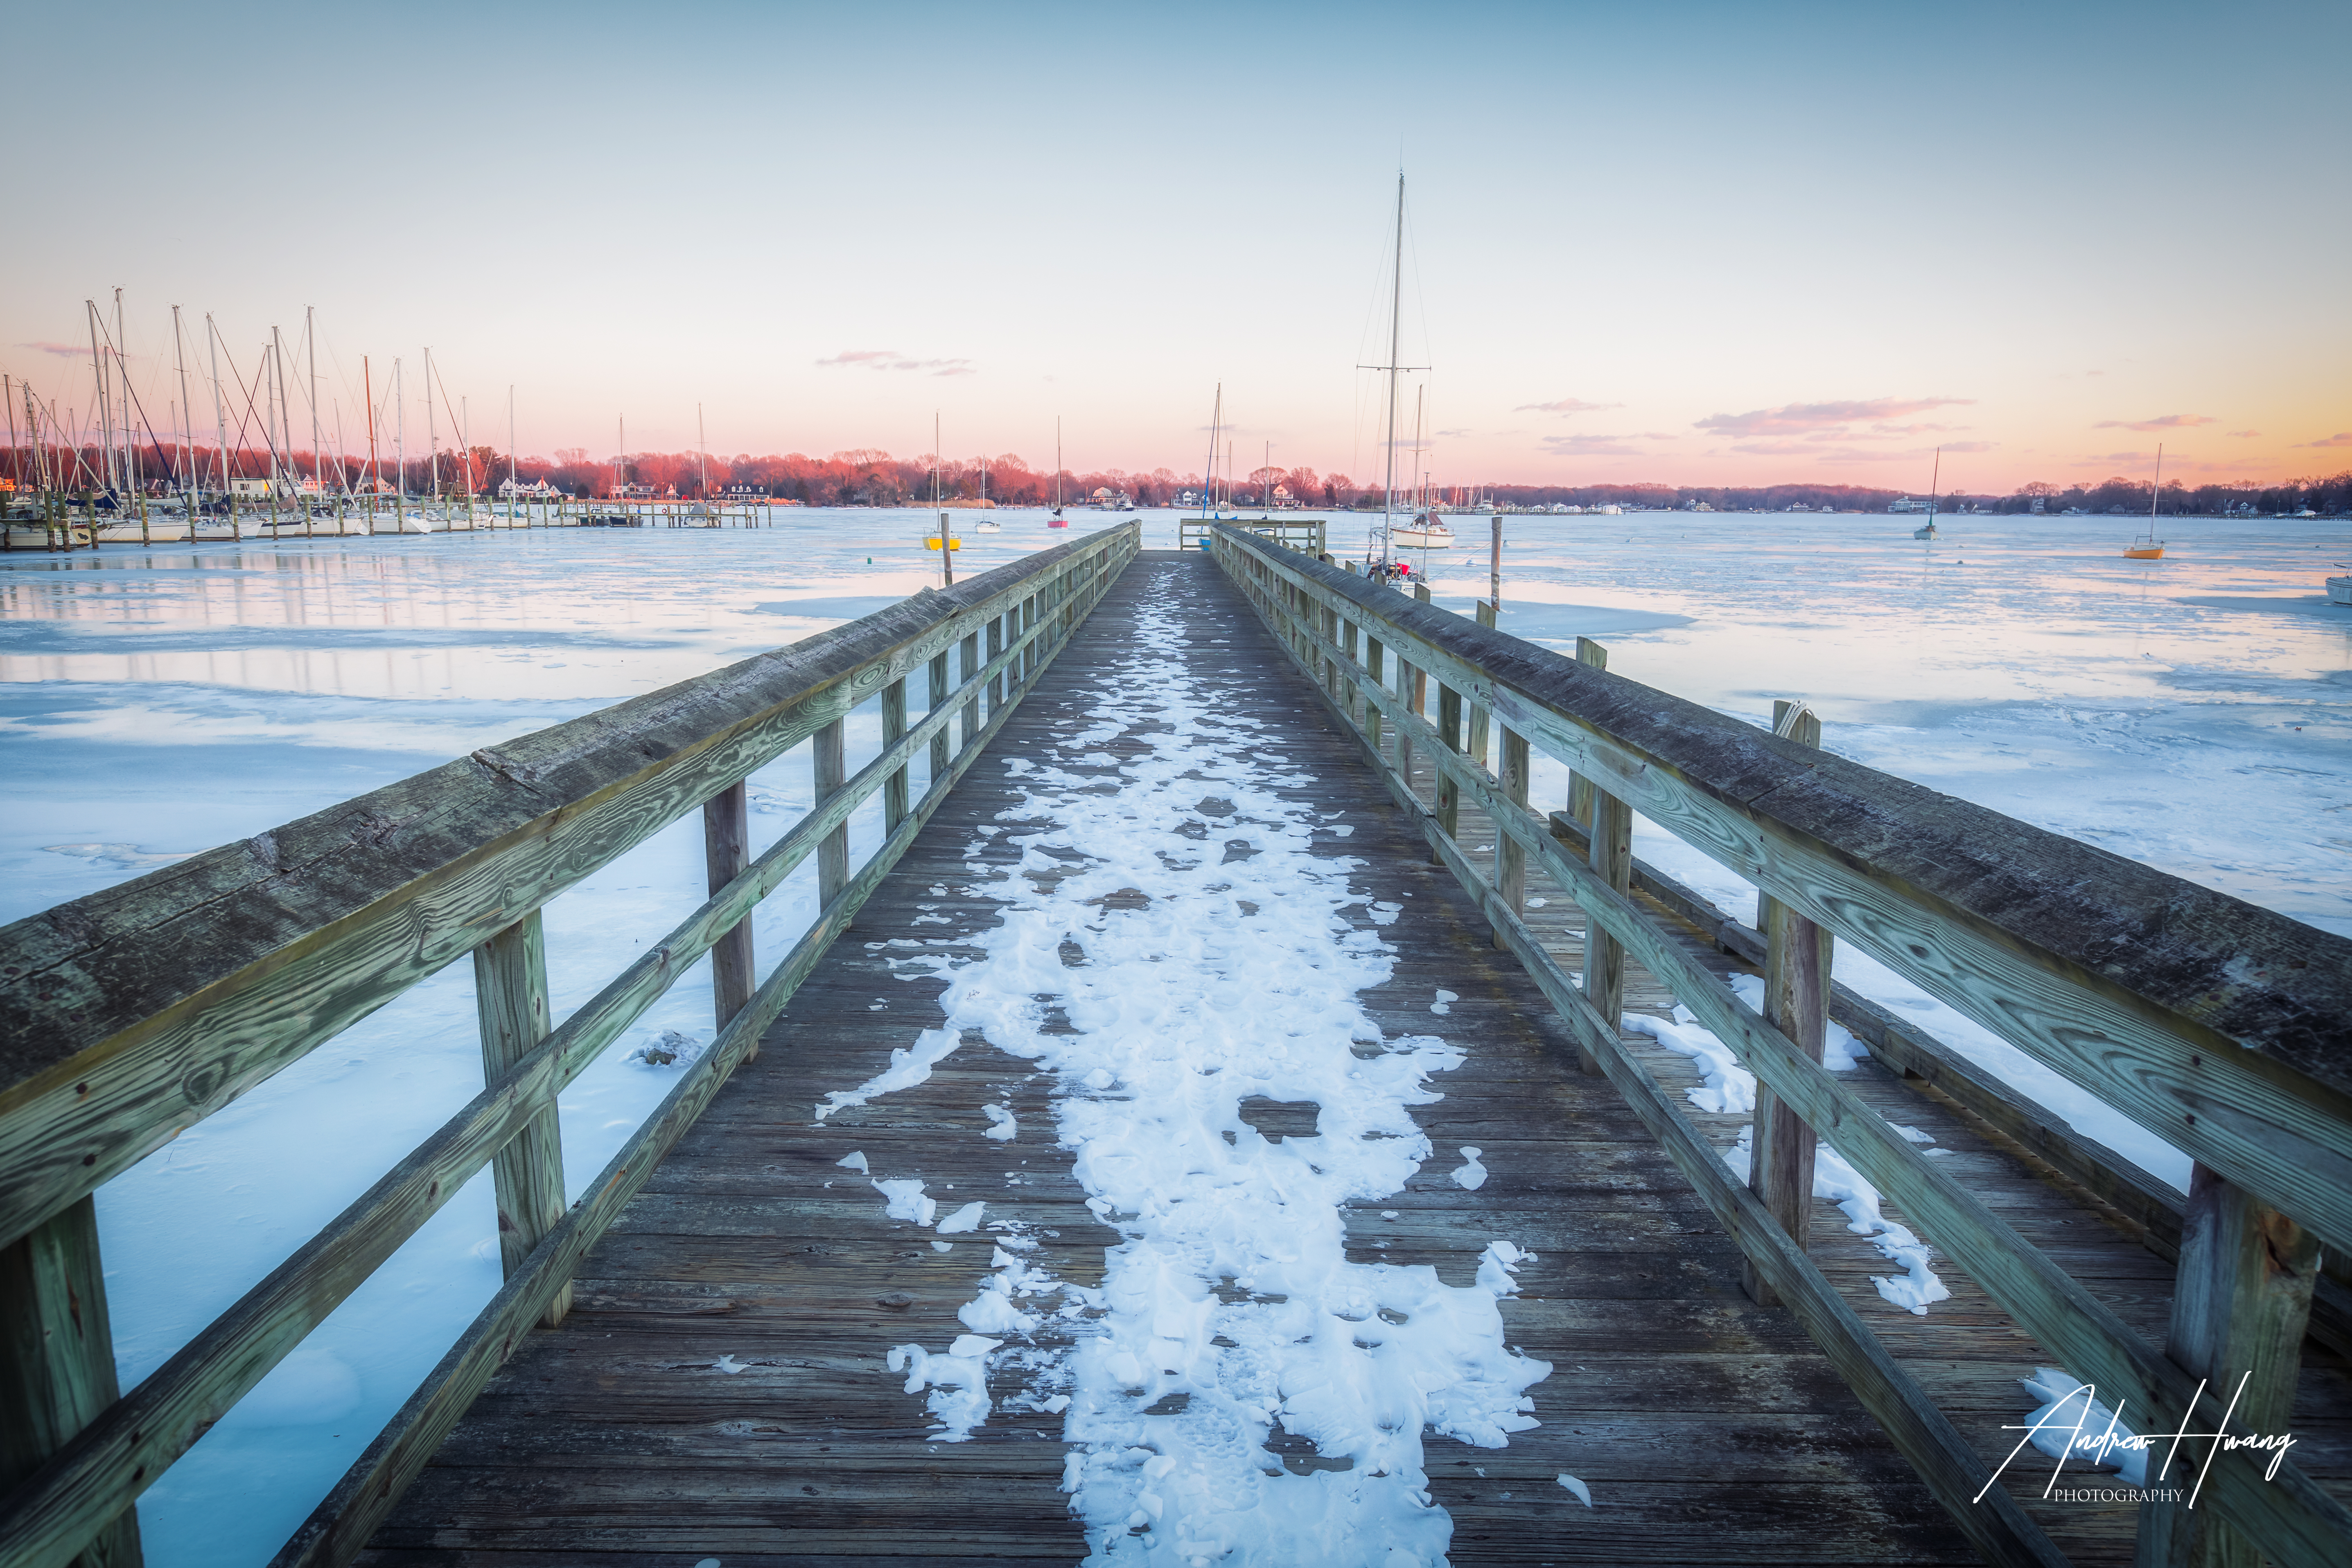 Frozen Pier Pirates Cove Galesville MD